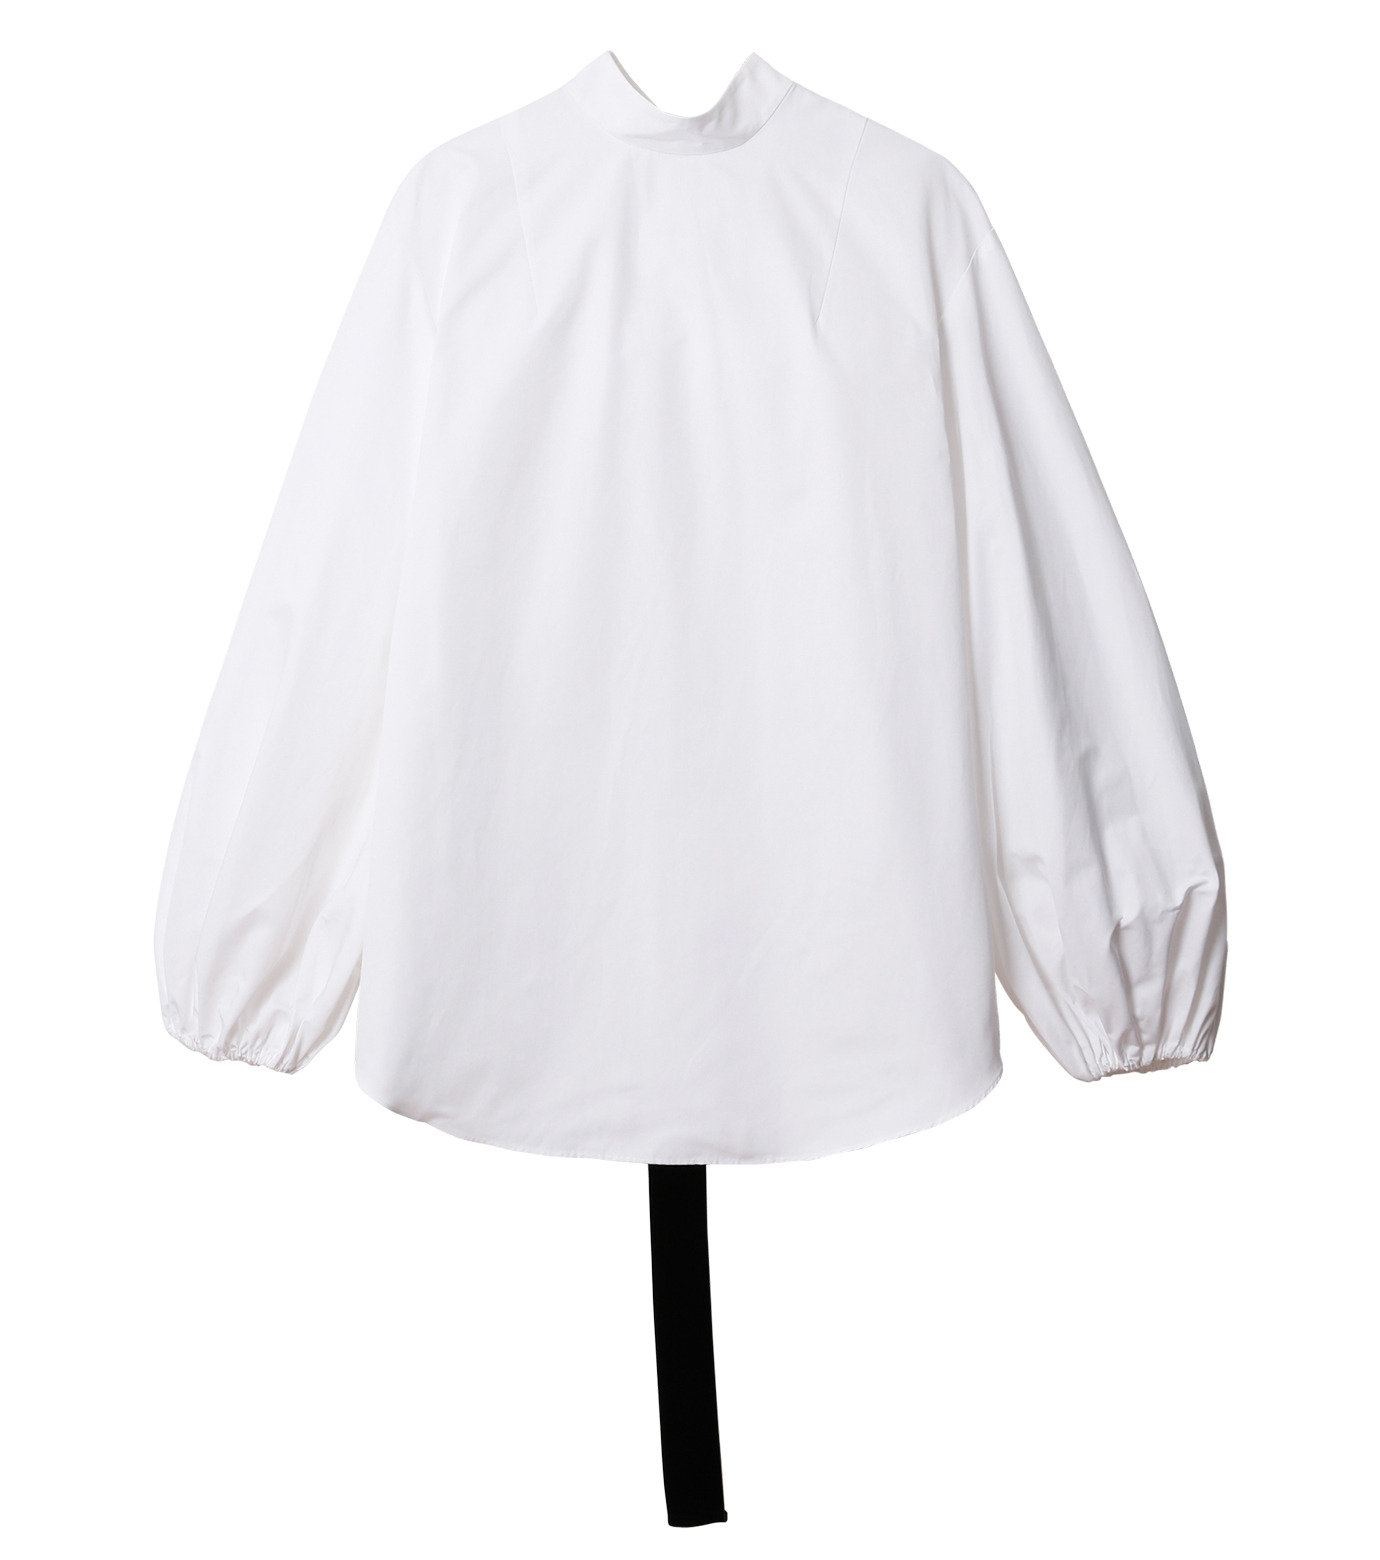 IRENE(アイレネ)のブァッファンスリーブトップス-WHITE(シャツ/shirt)-18A83004 拡大詳細画像7